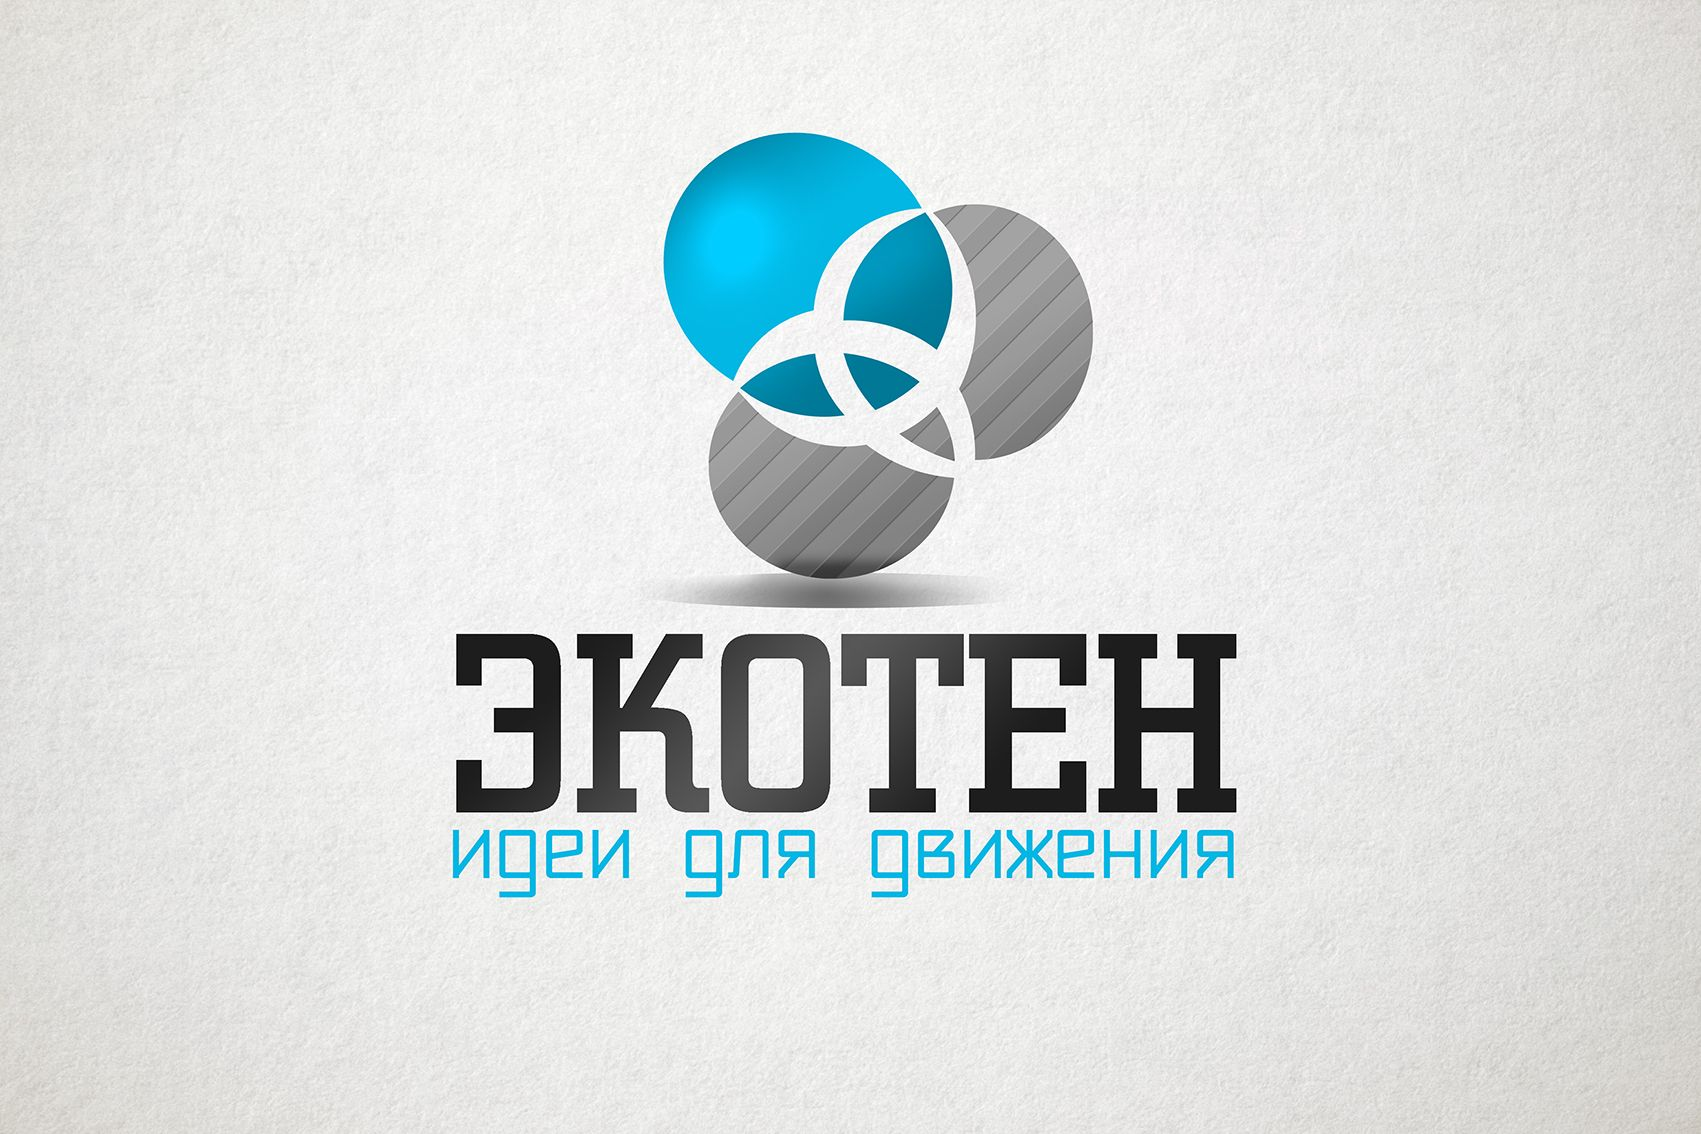 Логотип для научно - технического концерна - дизайнер funkielevis